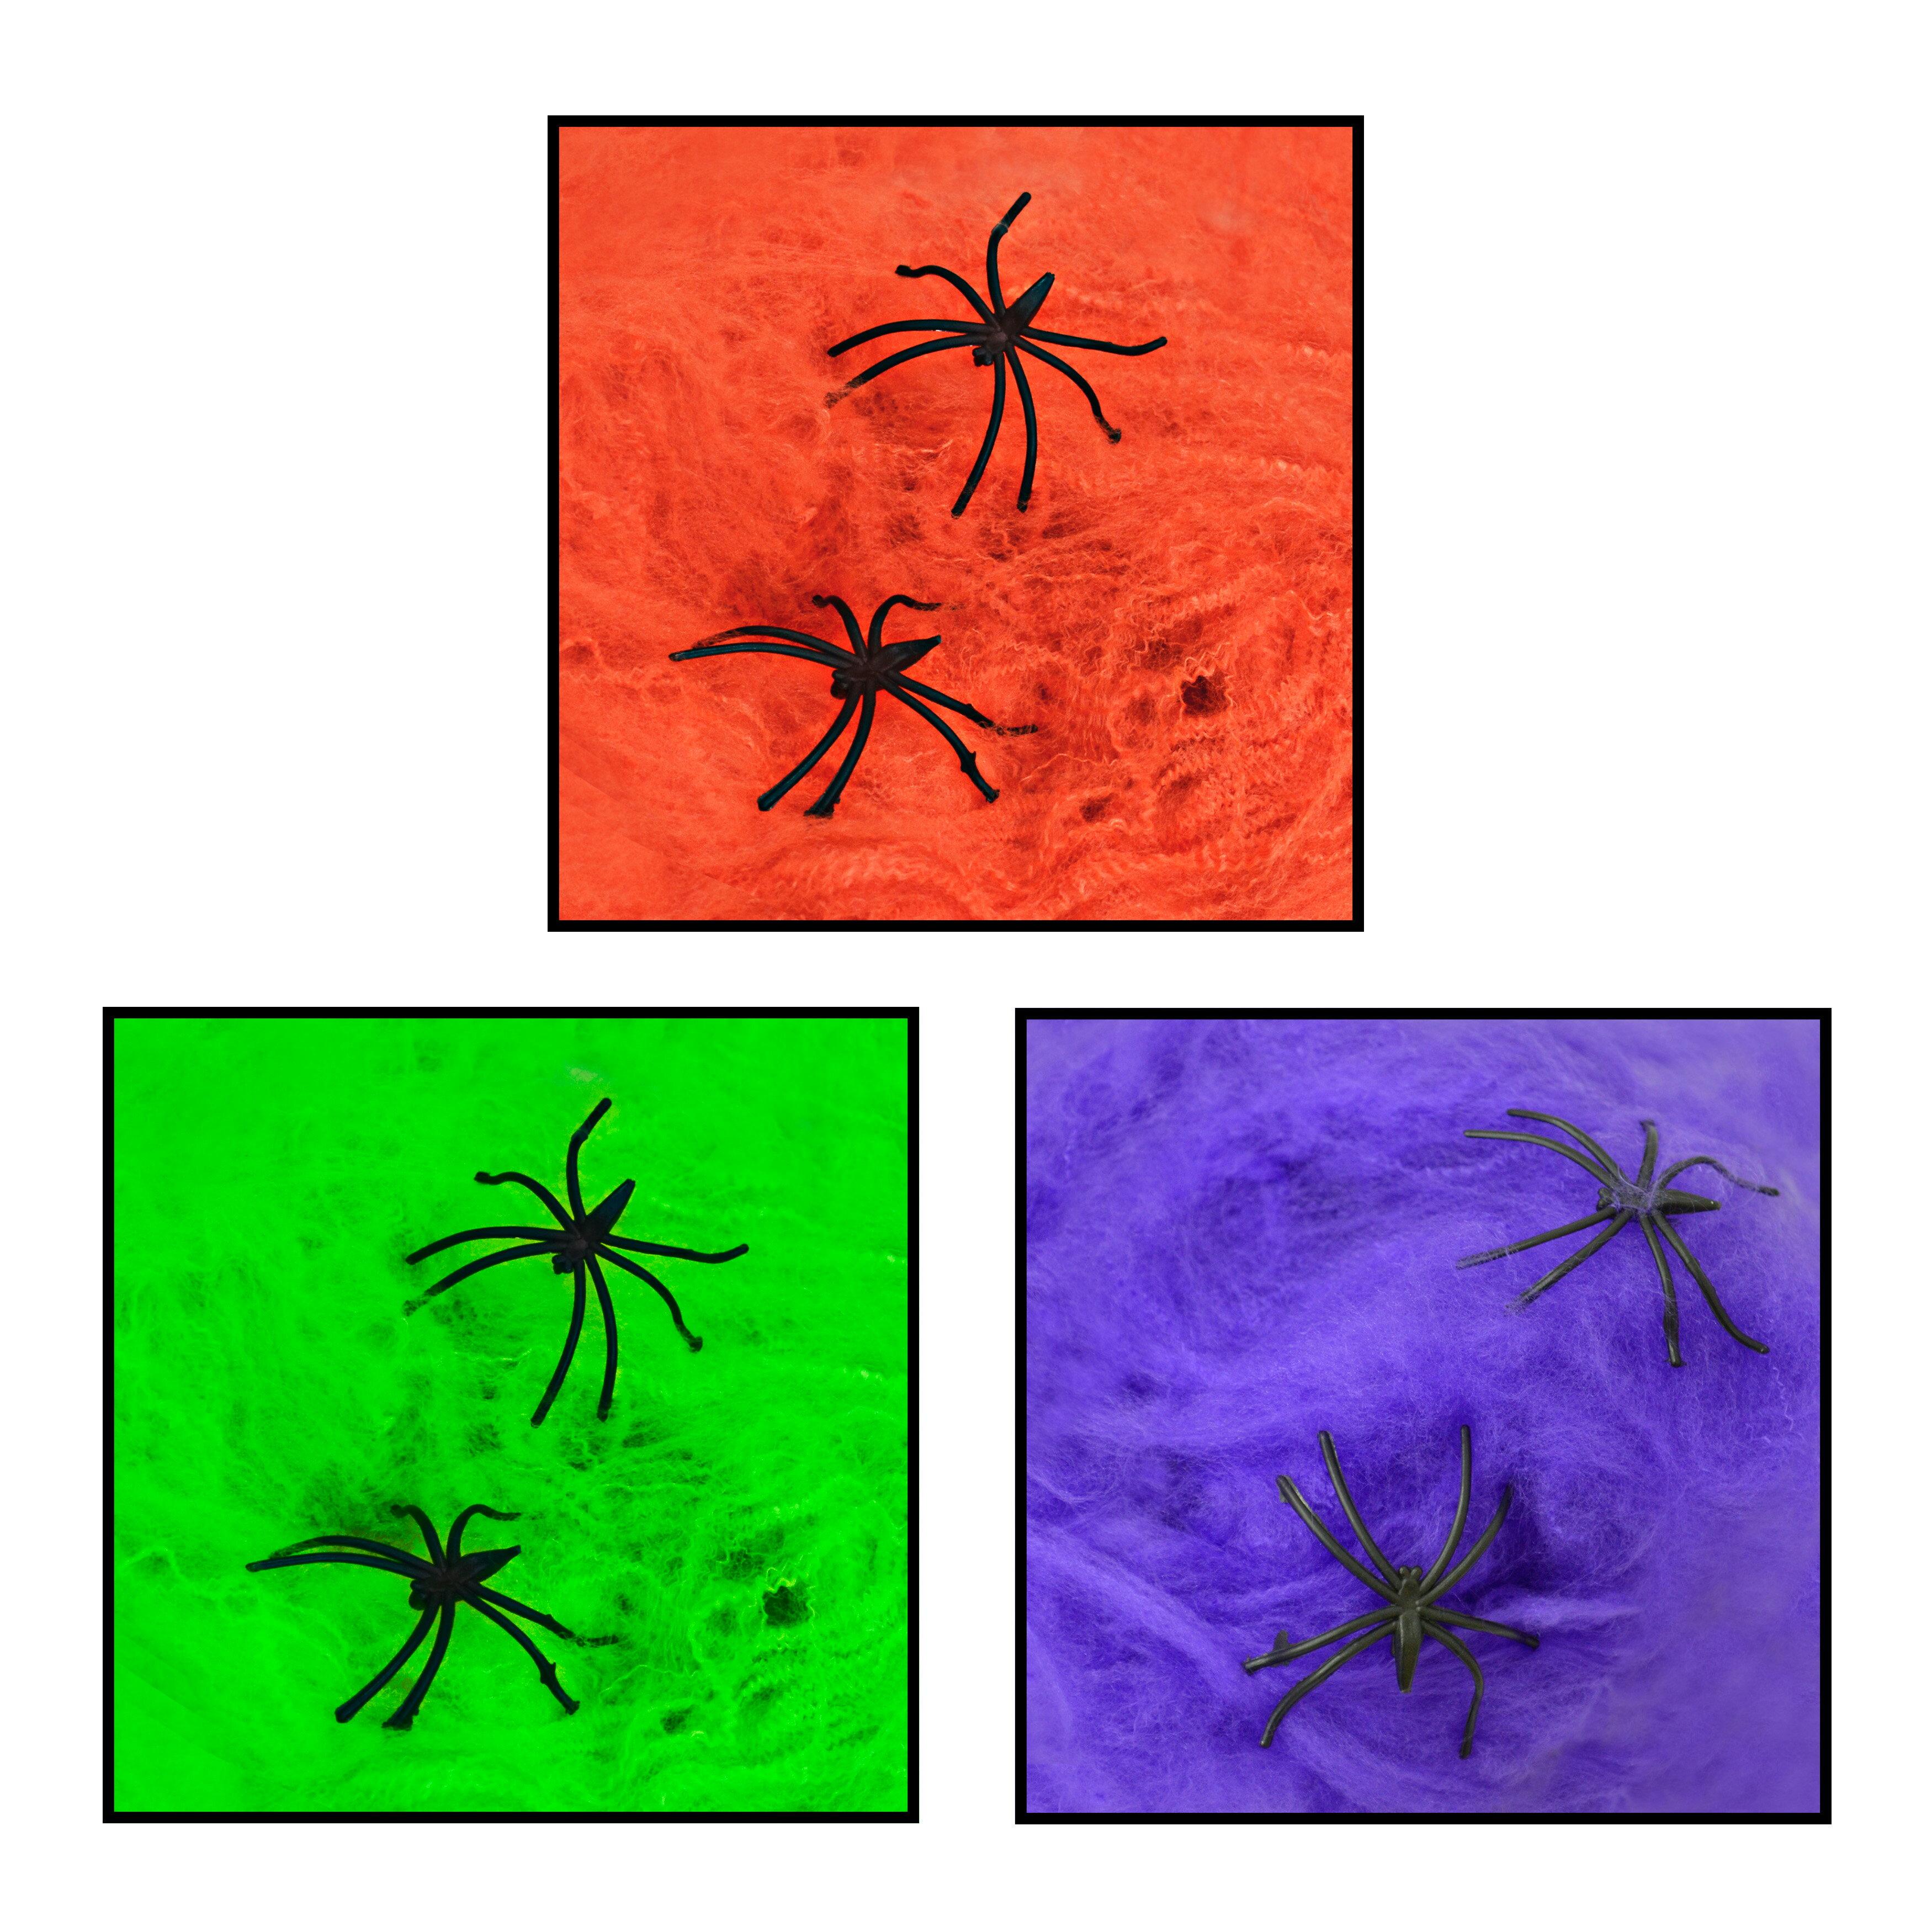 X射線【W278927】20克彩色蜘蛛網加蜘蛛(綠.紫.橘三色),萬聖節/佈置/掛飾/擺飾/蜘蛛/派對/角色扮演/化妝舞會/表演/話劇